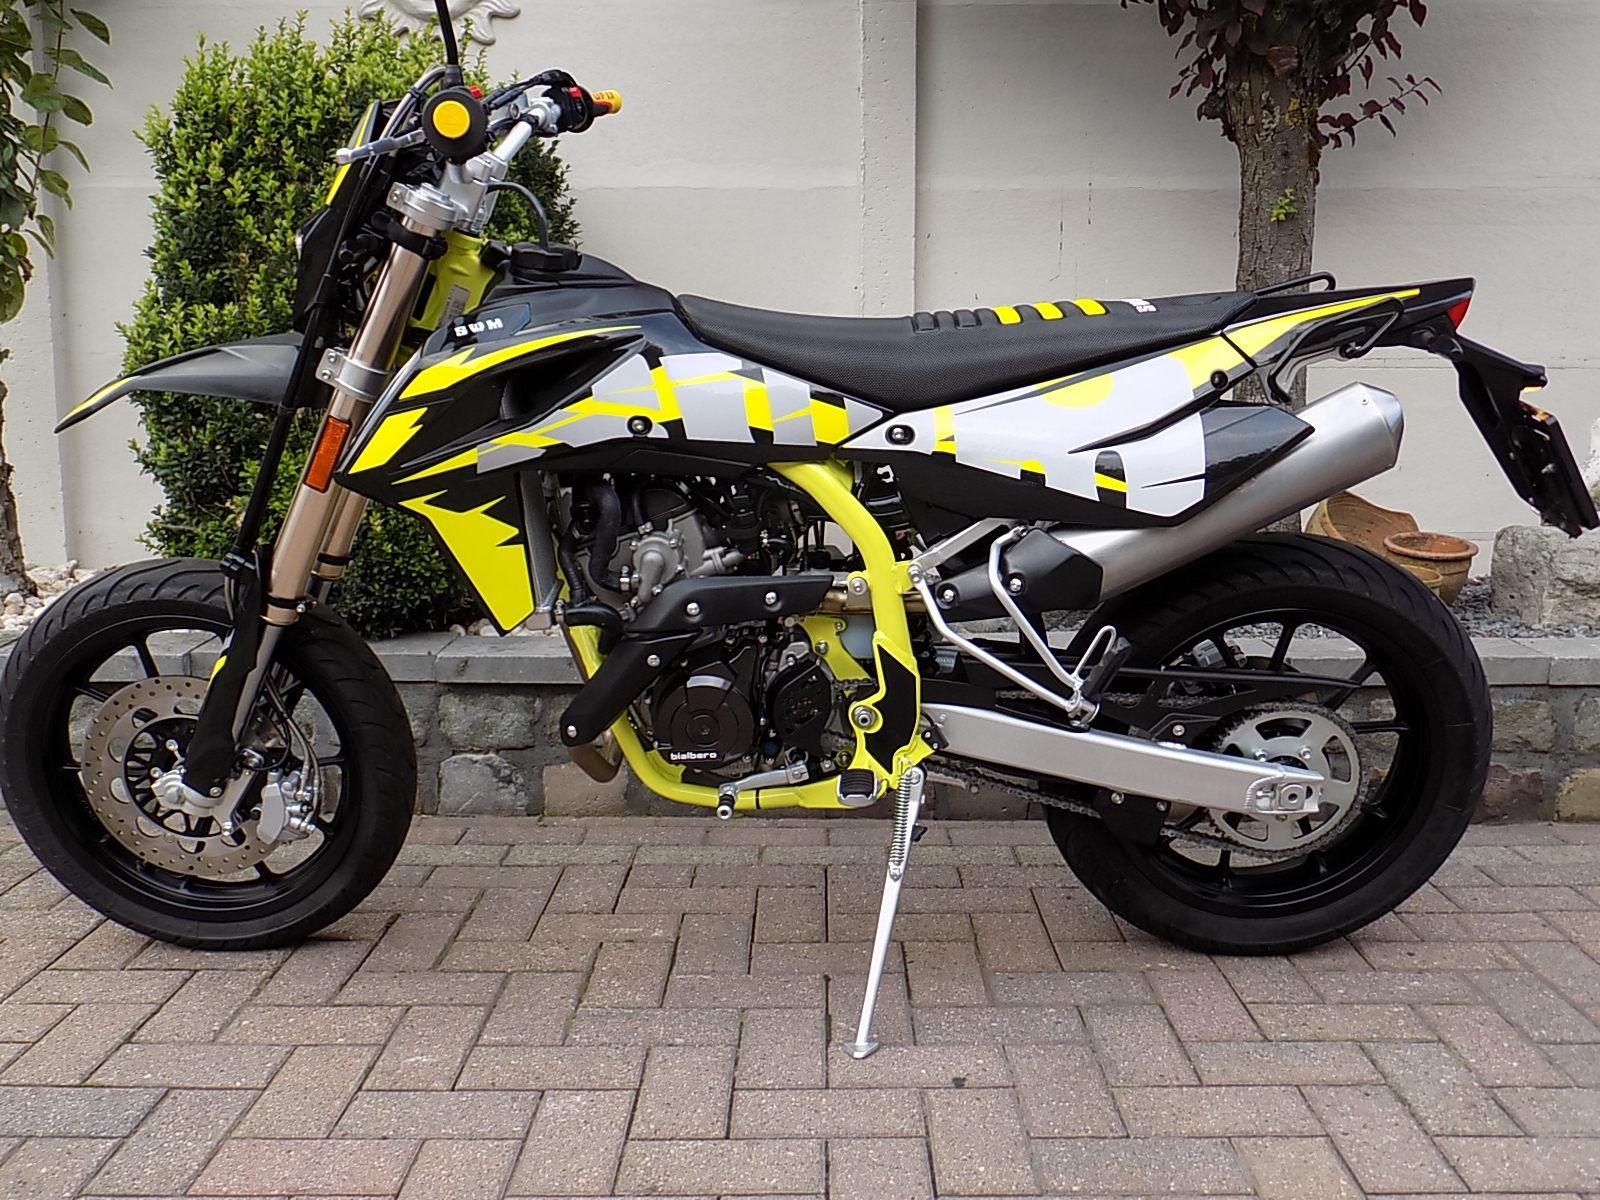 SWM SM 125 R Super moto super motard (VERKOCHT)!!!